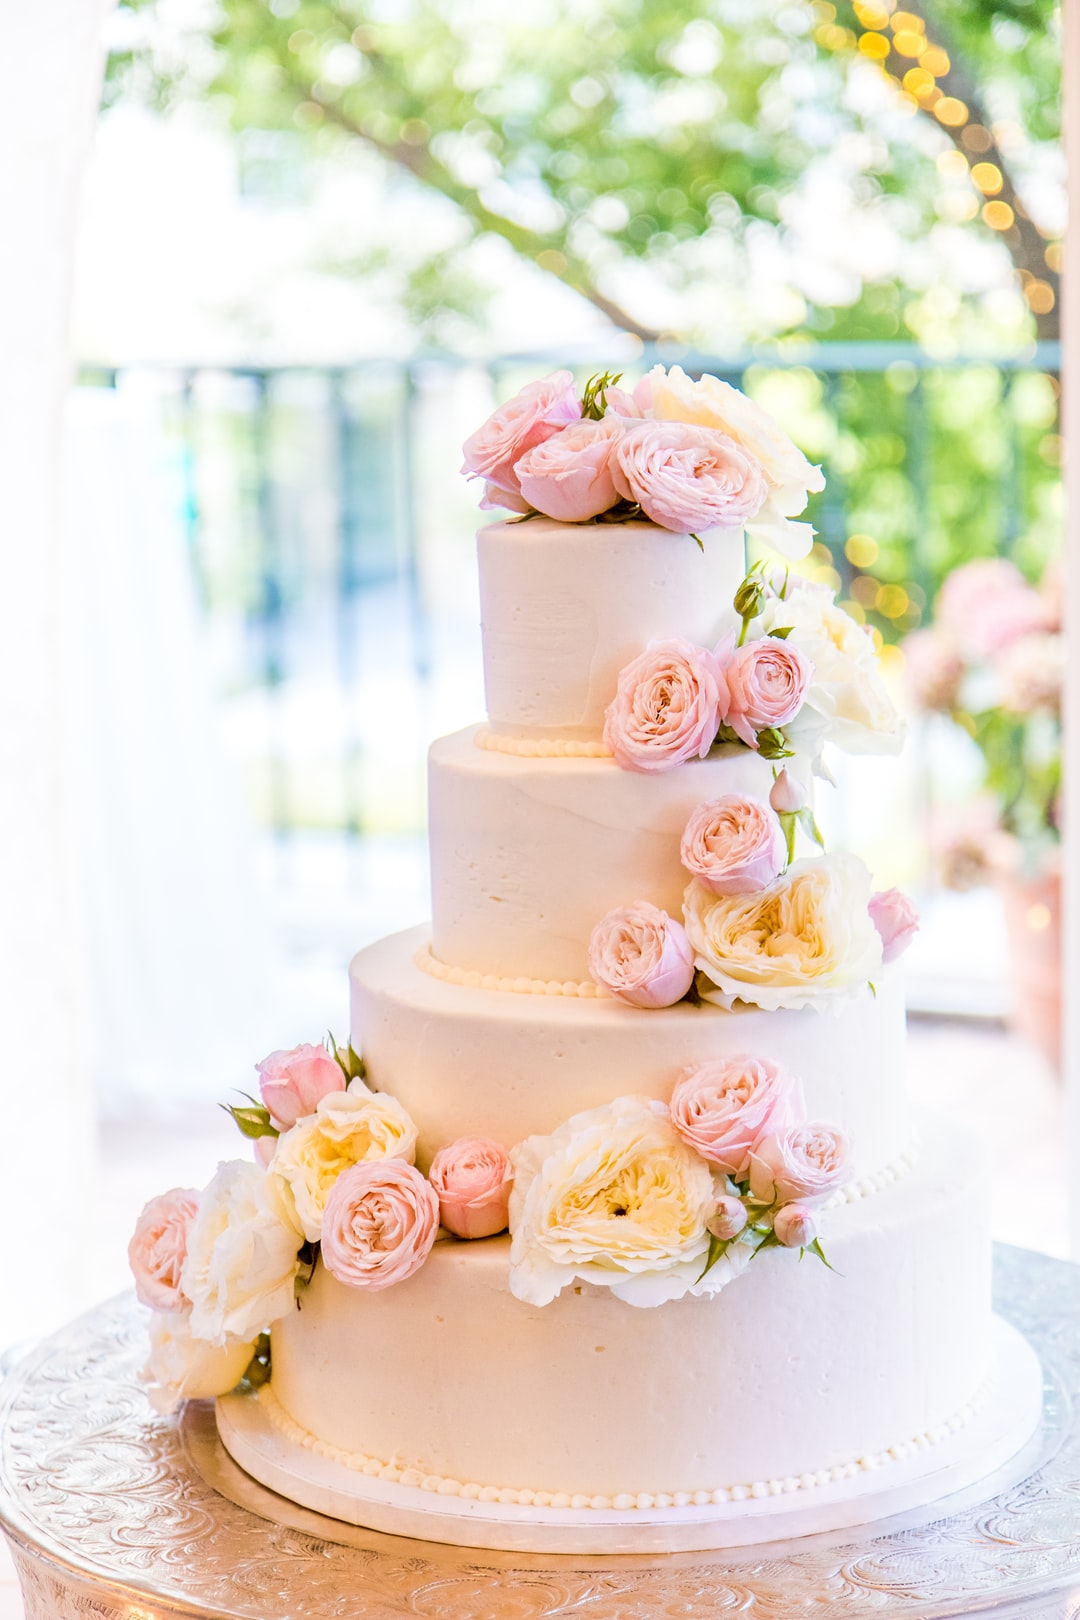 100 Wedding Cake Pictures Download Free Images On Unsplash